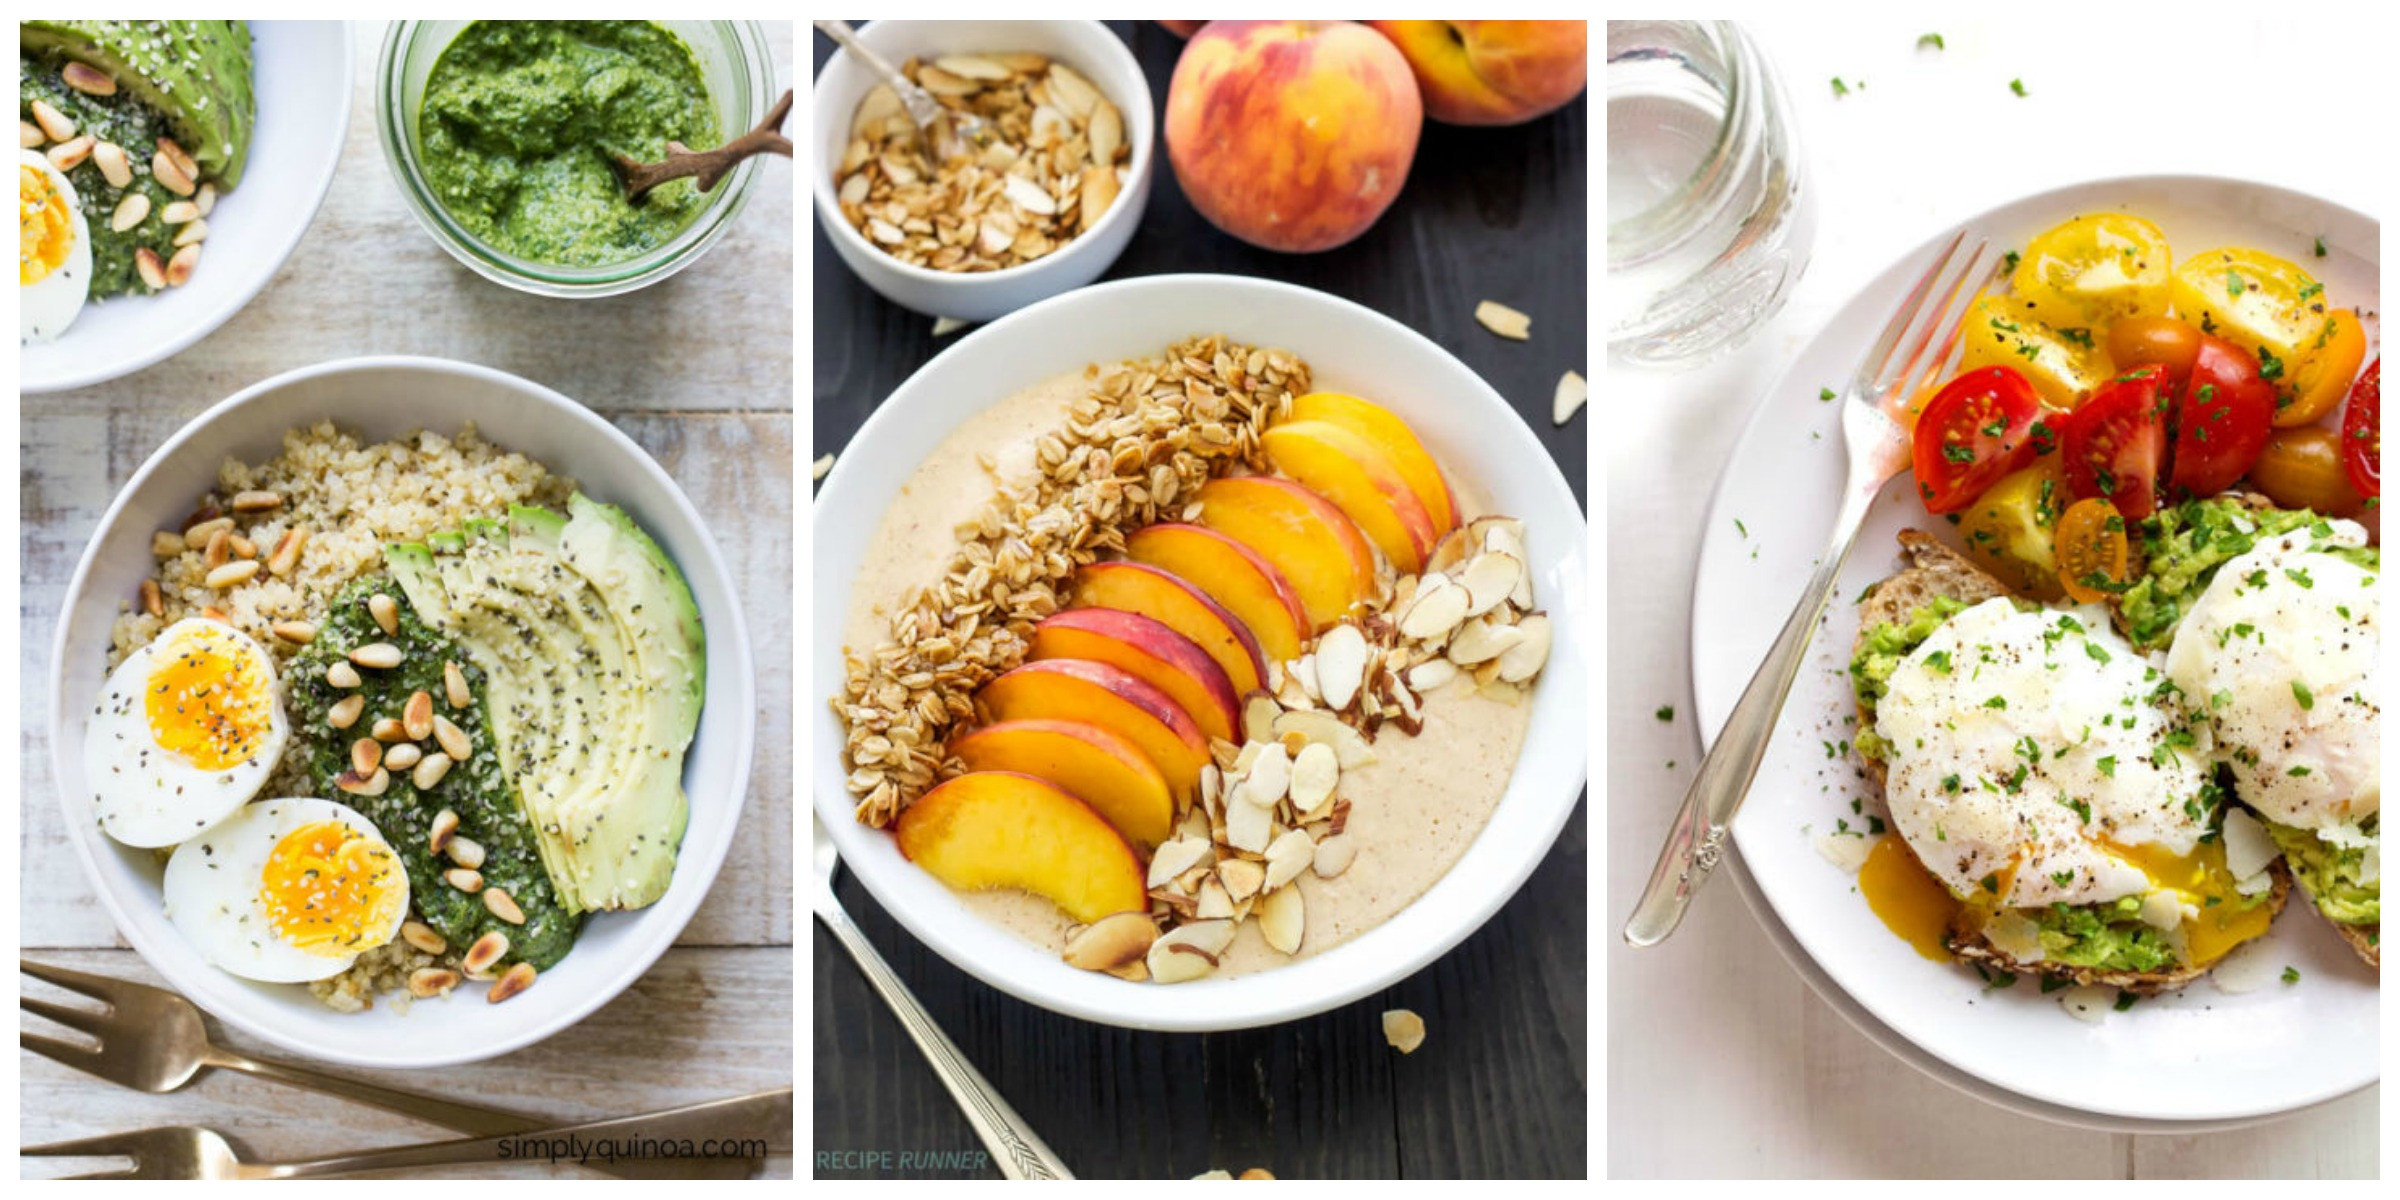 Good Healthy Breakfast Ideas  20 Best Healthy Breakfast Food Ideas Recipes for Healthy